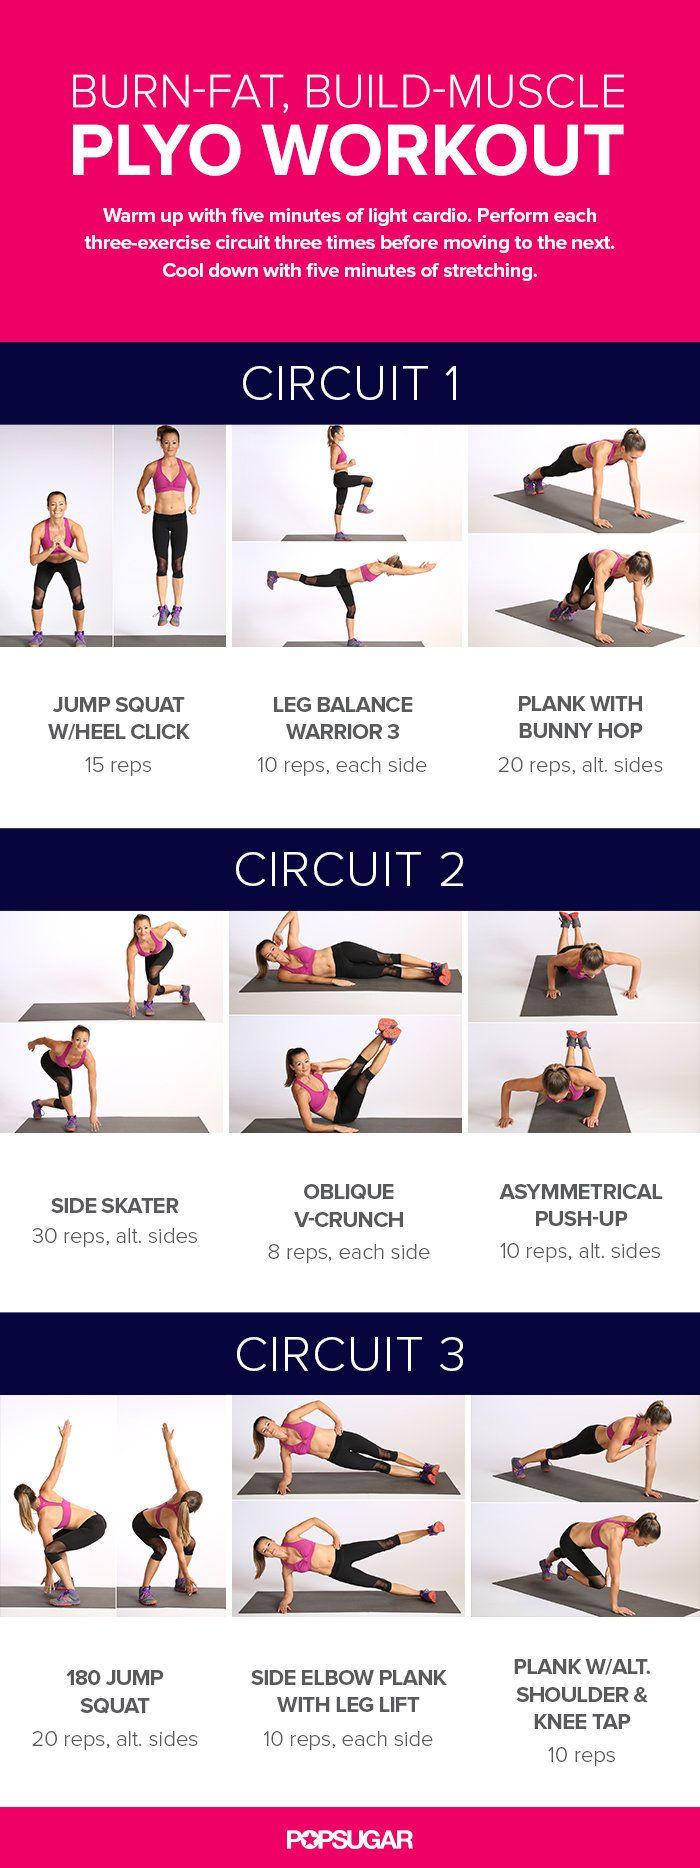 Circuit Workout With Plyometrics | POPSUGAR Fitness